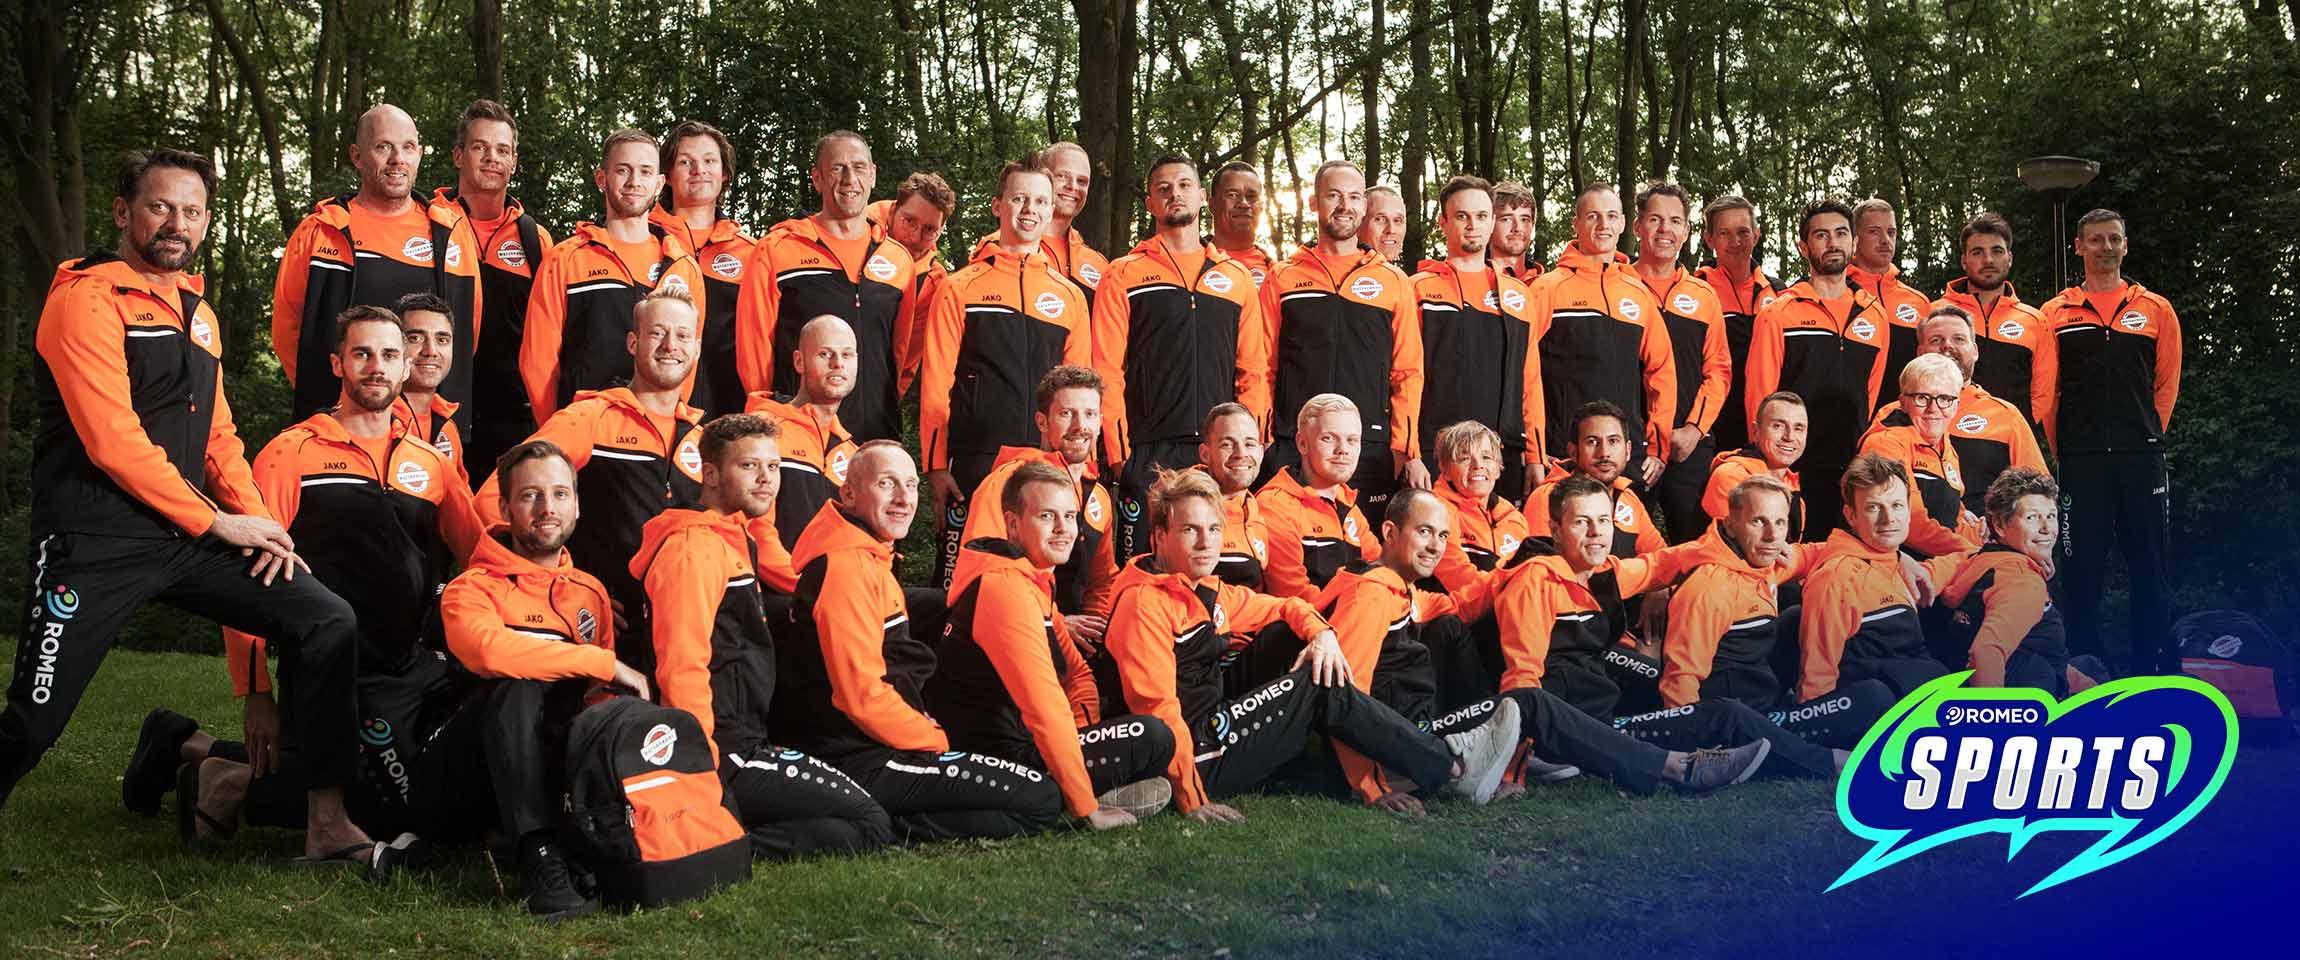 ROMEO Sports - Amsterdam Waterproof